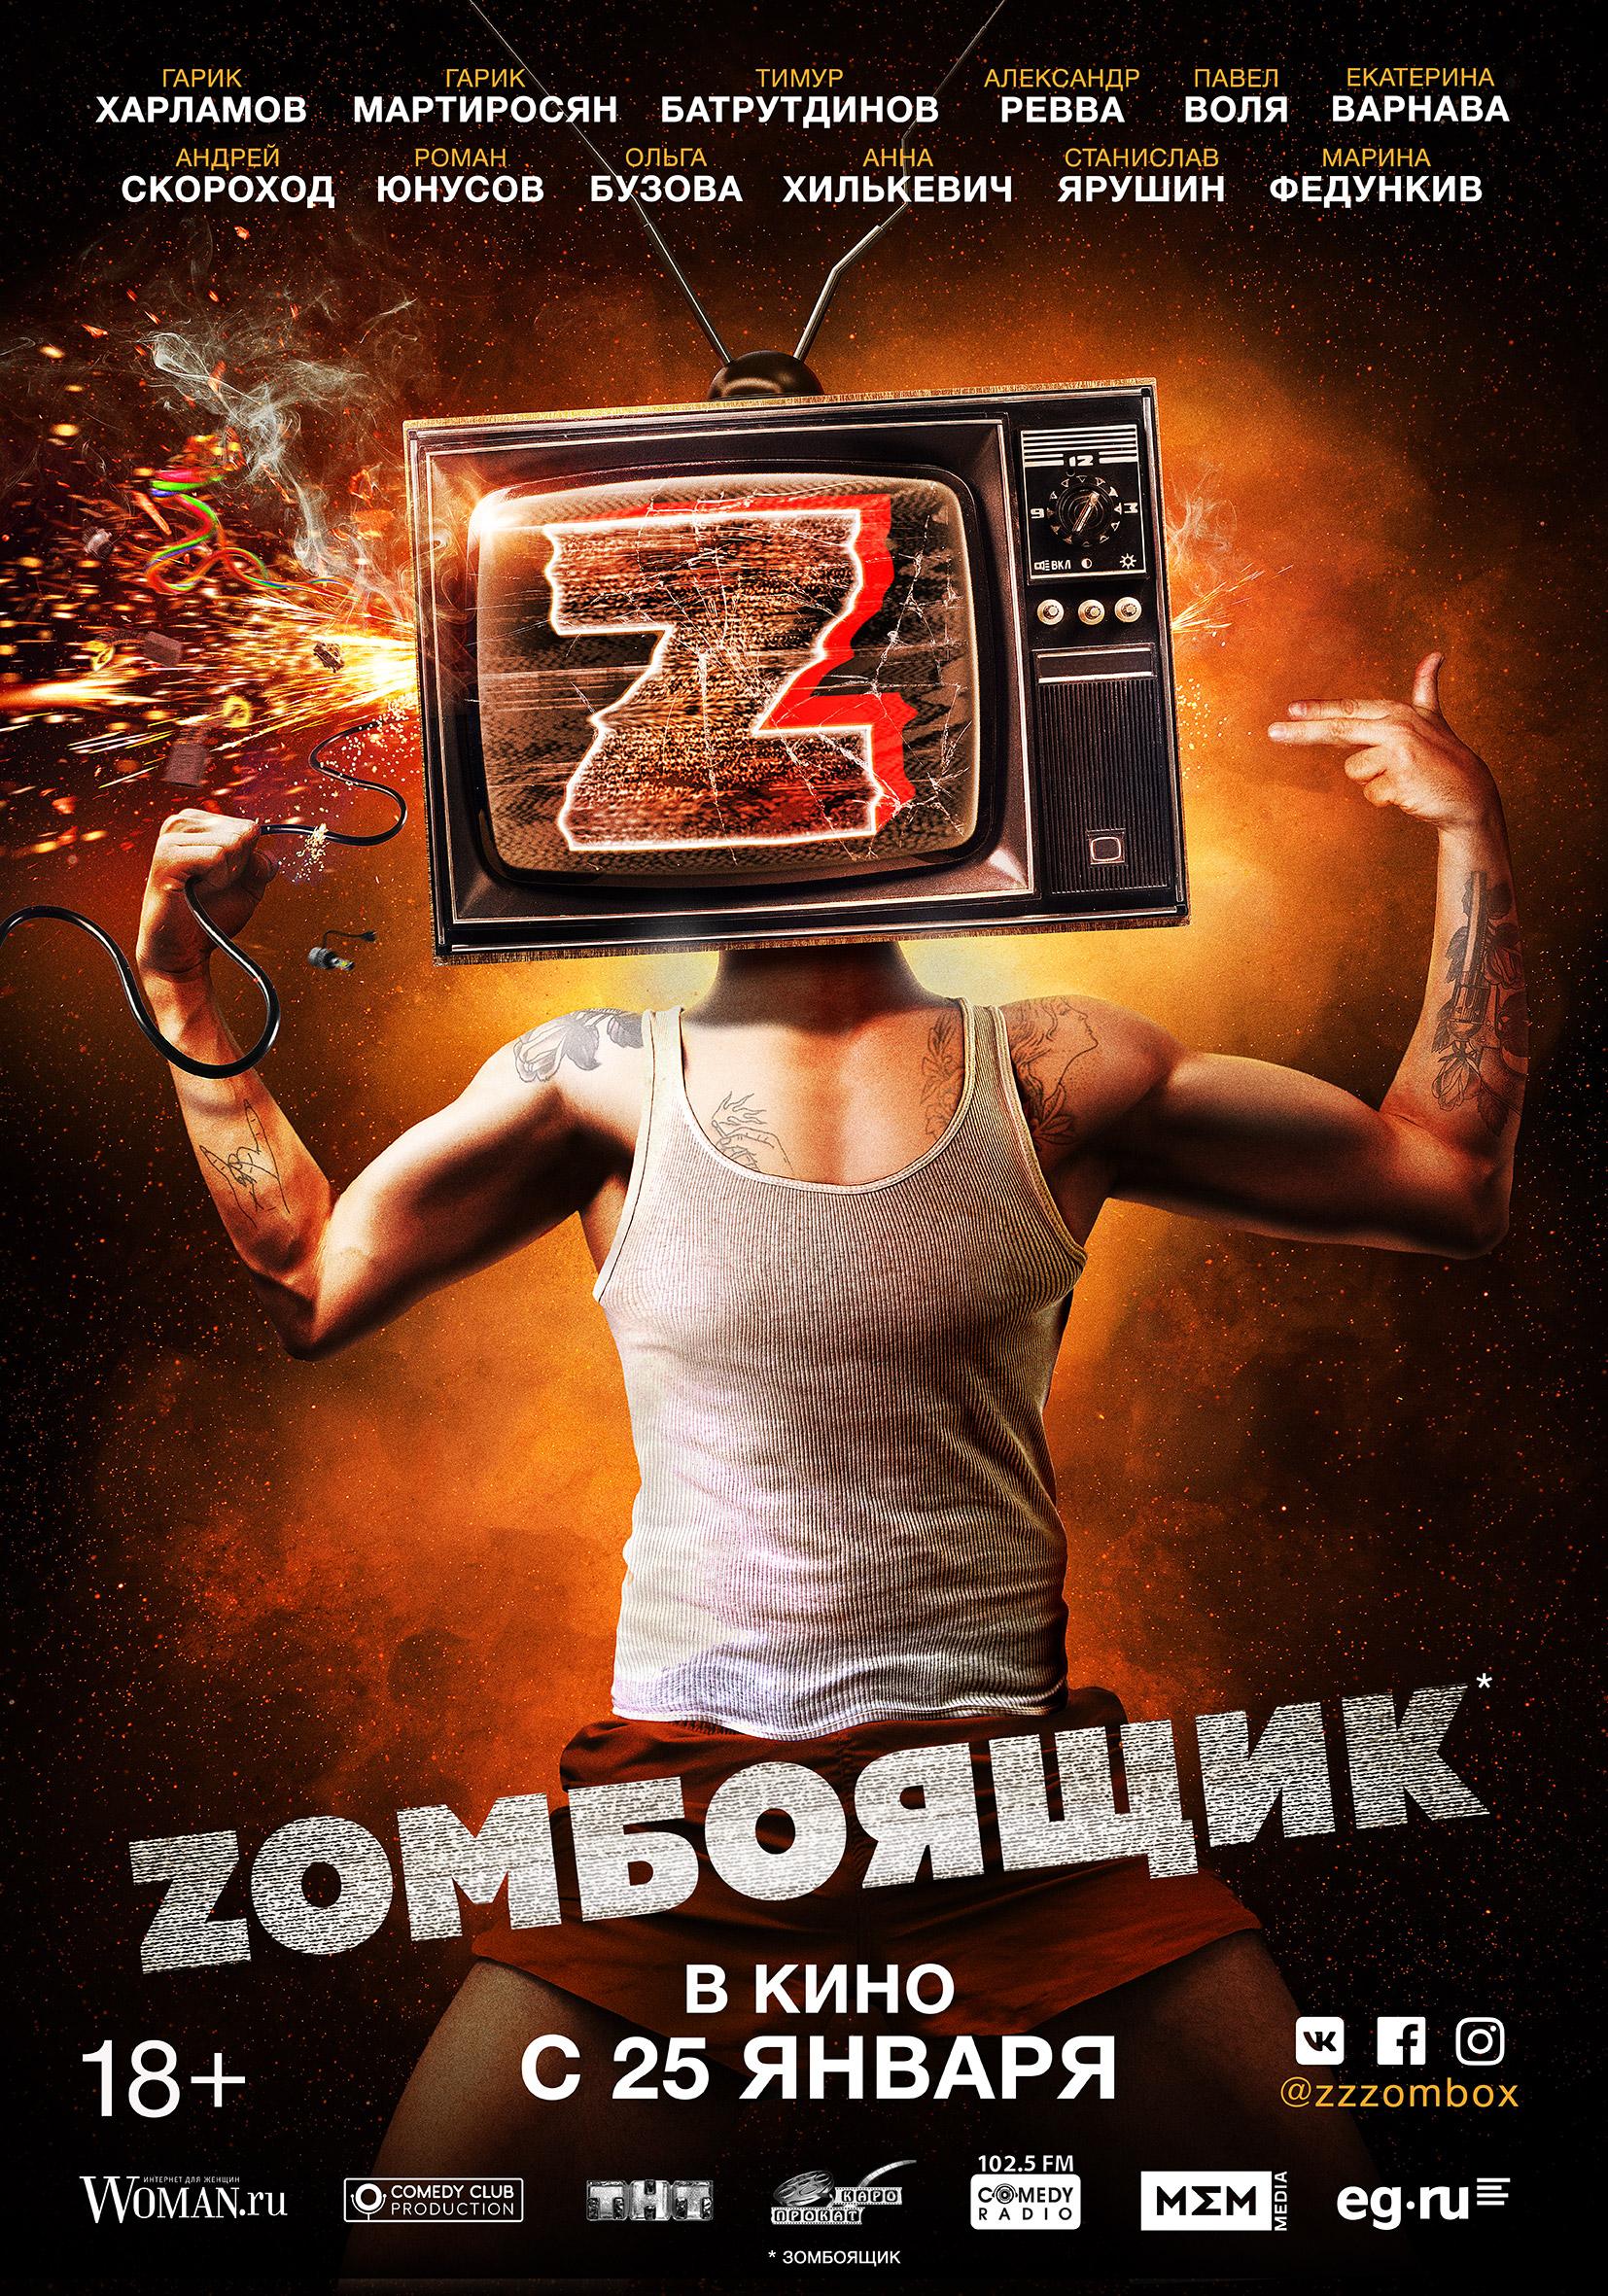 Garik Martirosyan sues the creators of advertising with his participation 12/31/2015 72